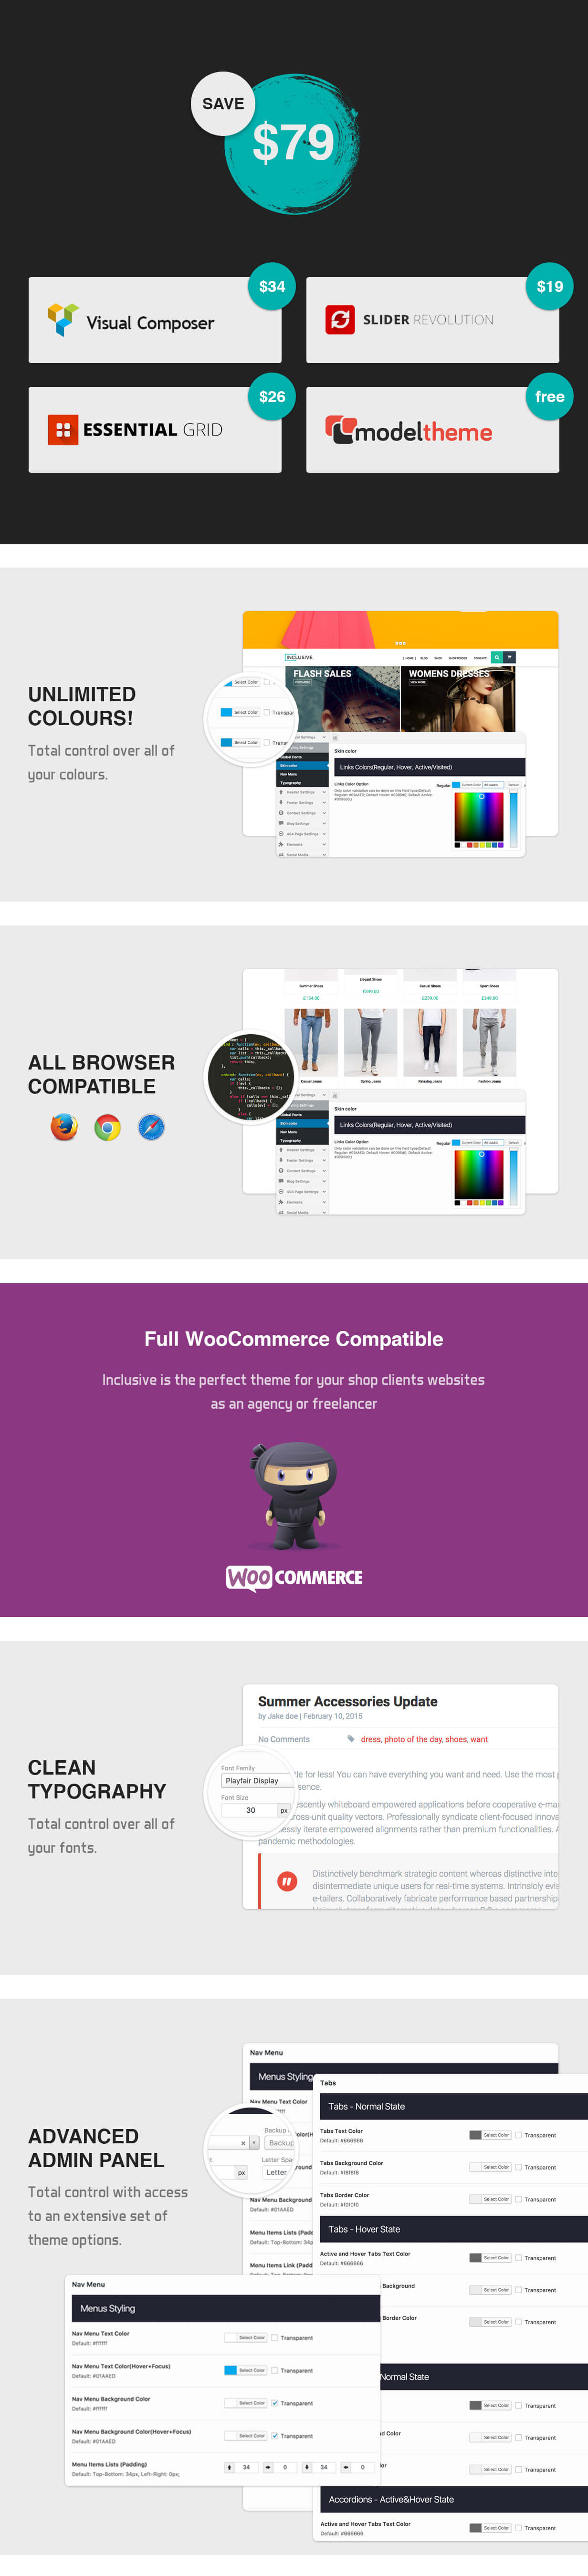 Inclusive - Multipurpose WooCommerce WordPress Theme - 4